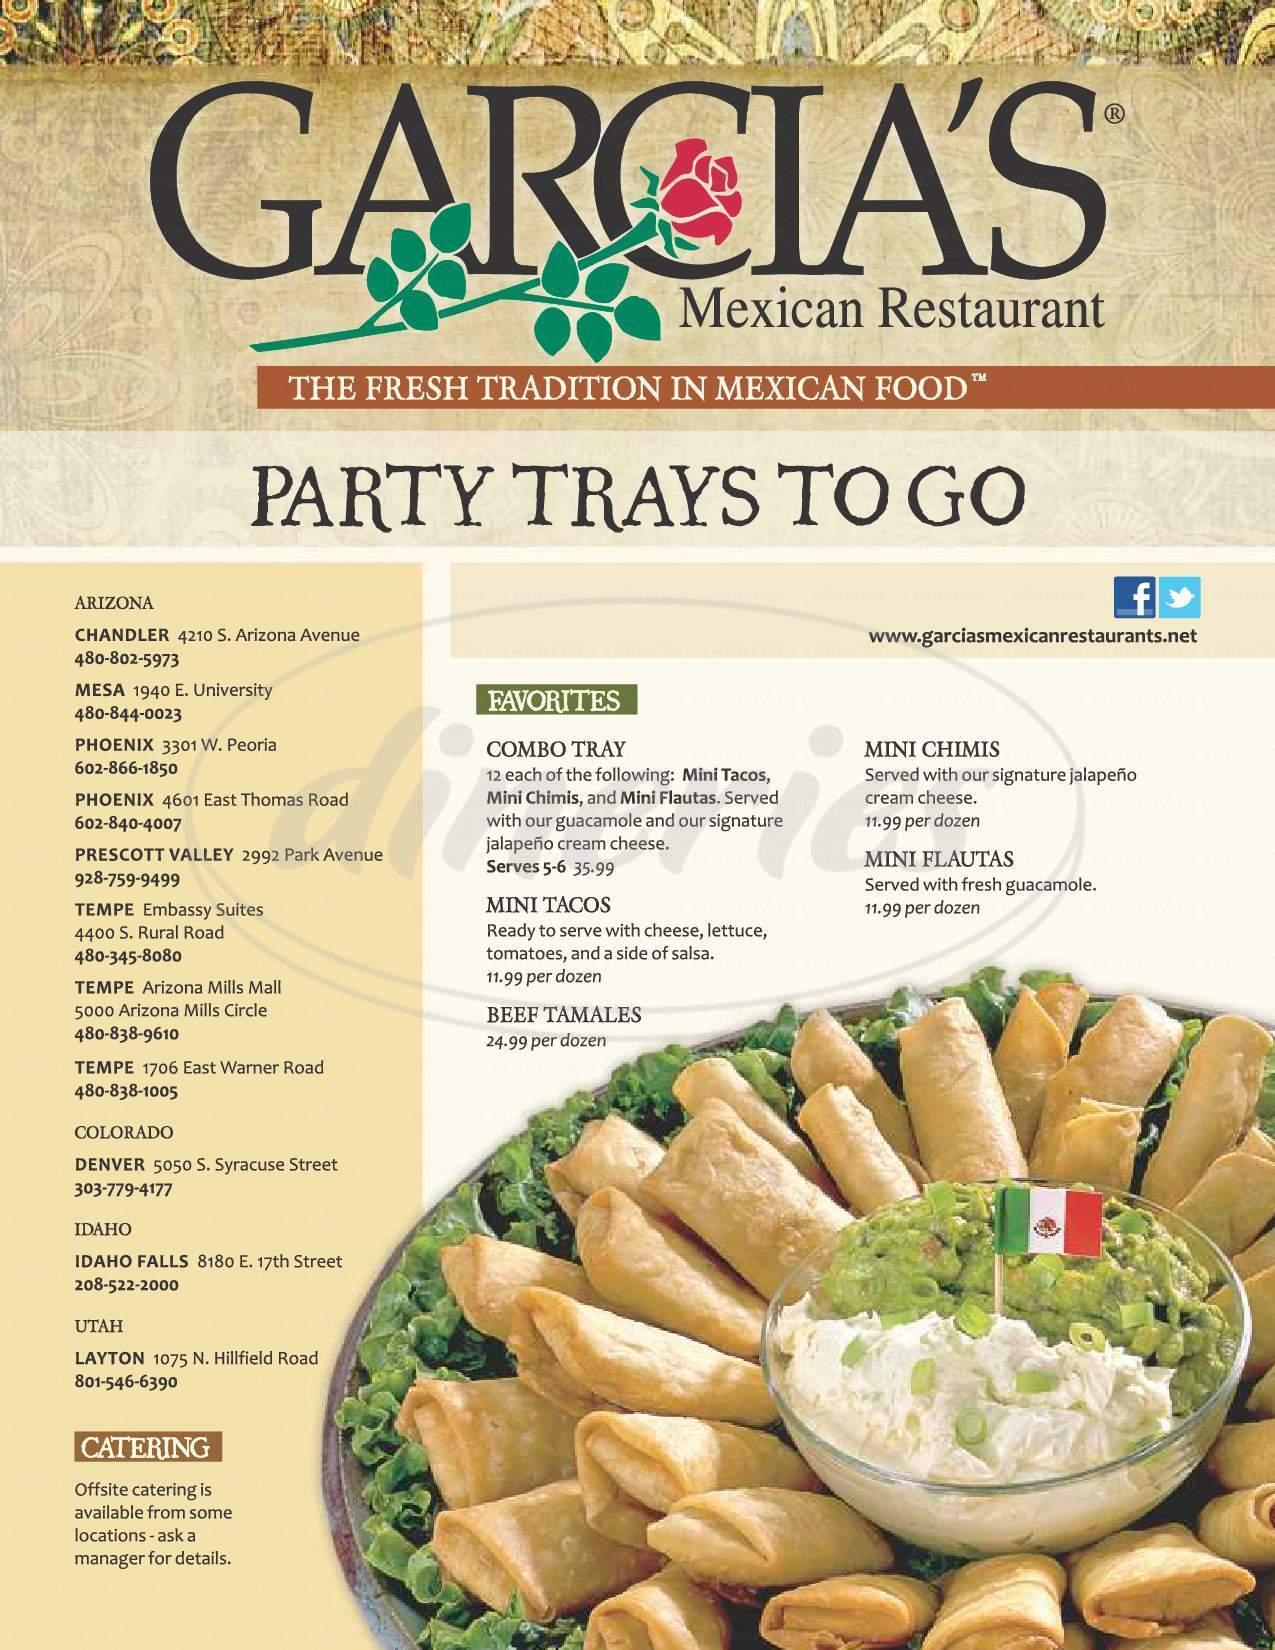 menu for Garcia's Mexican Restaurant